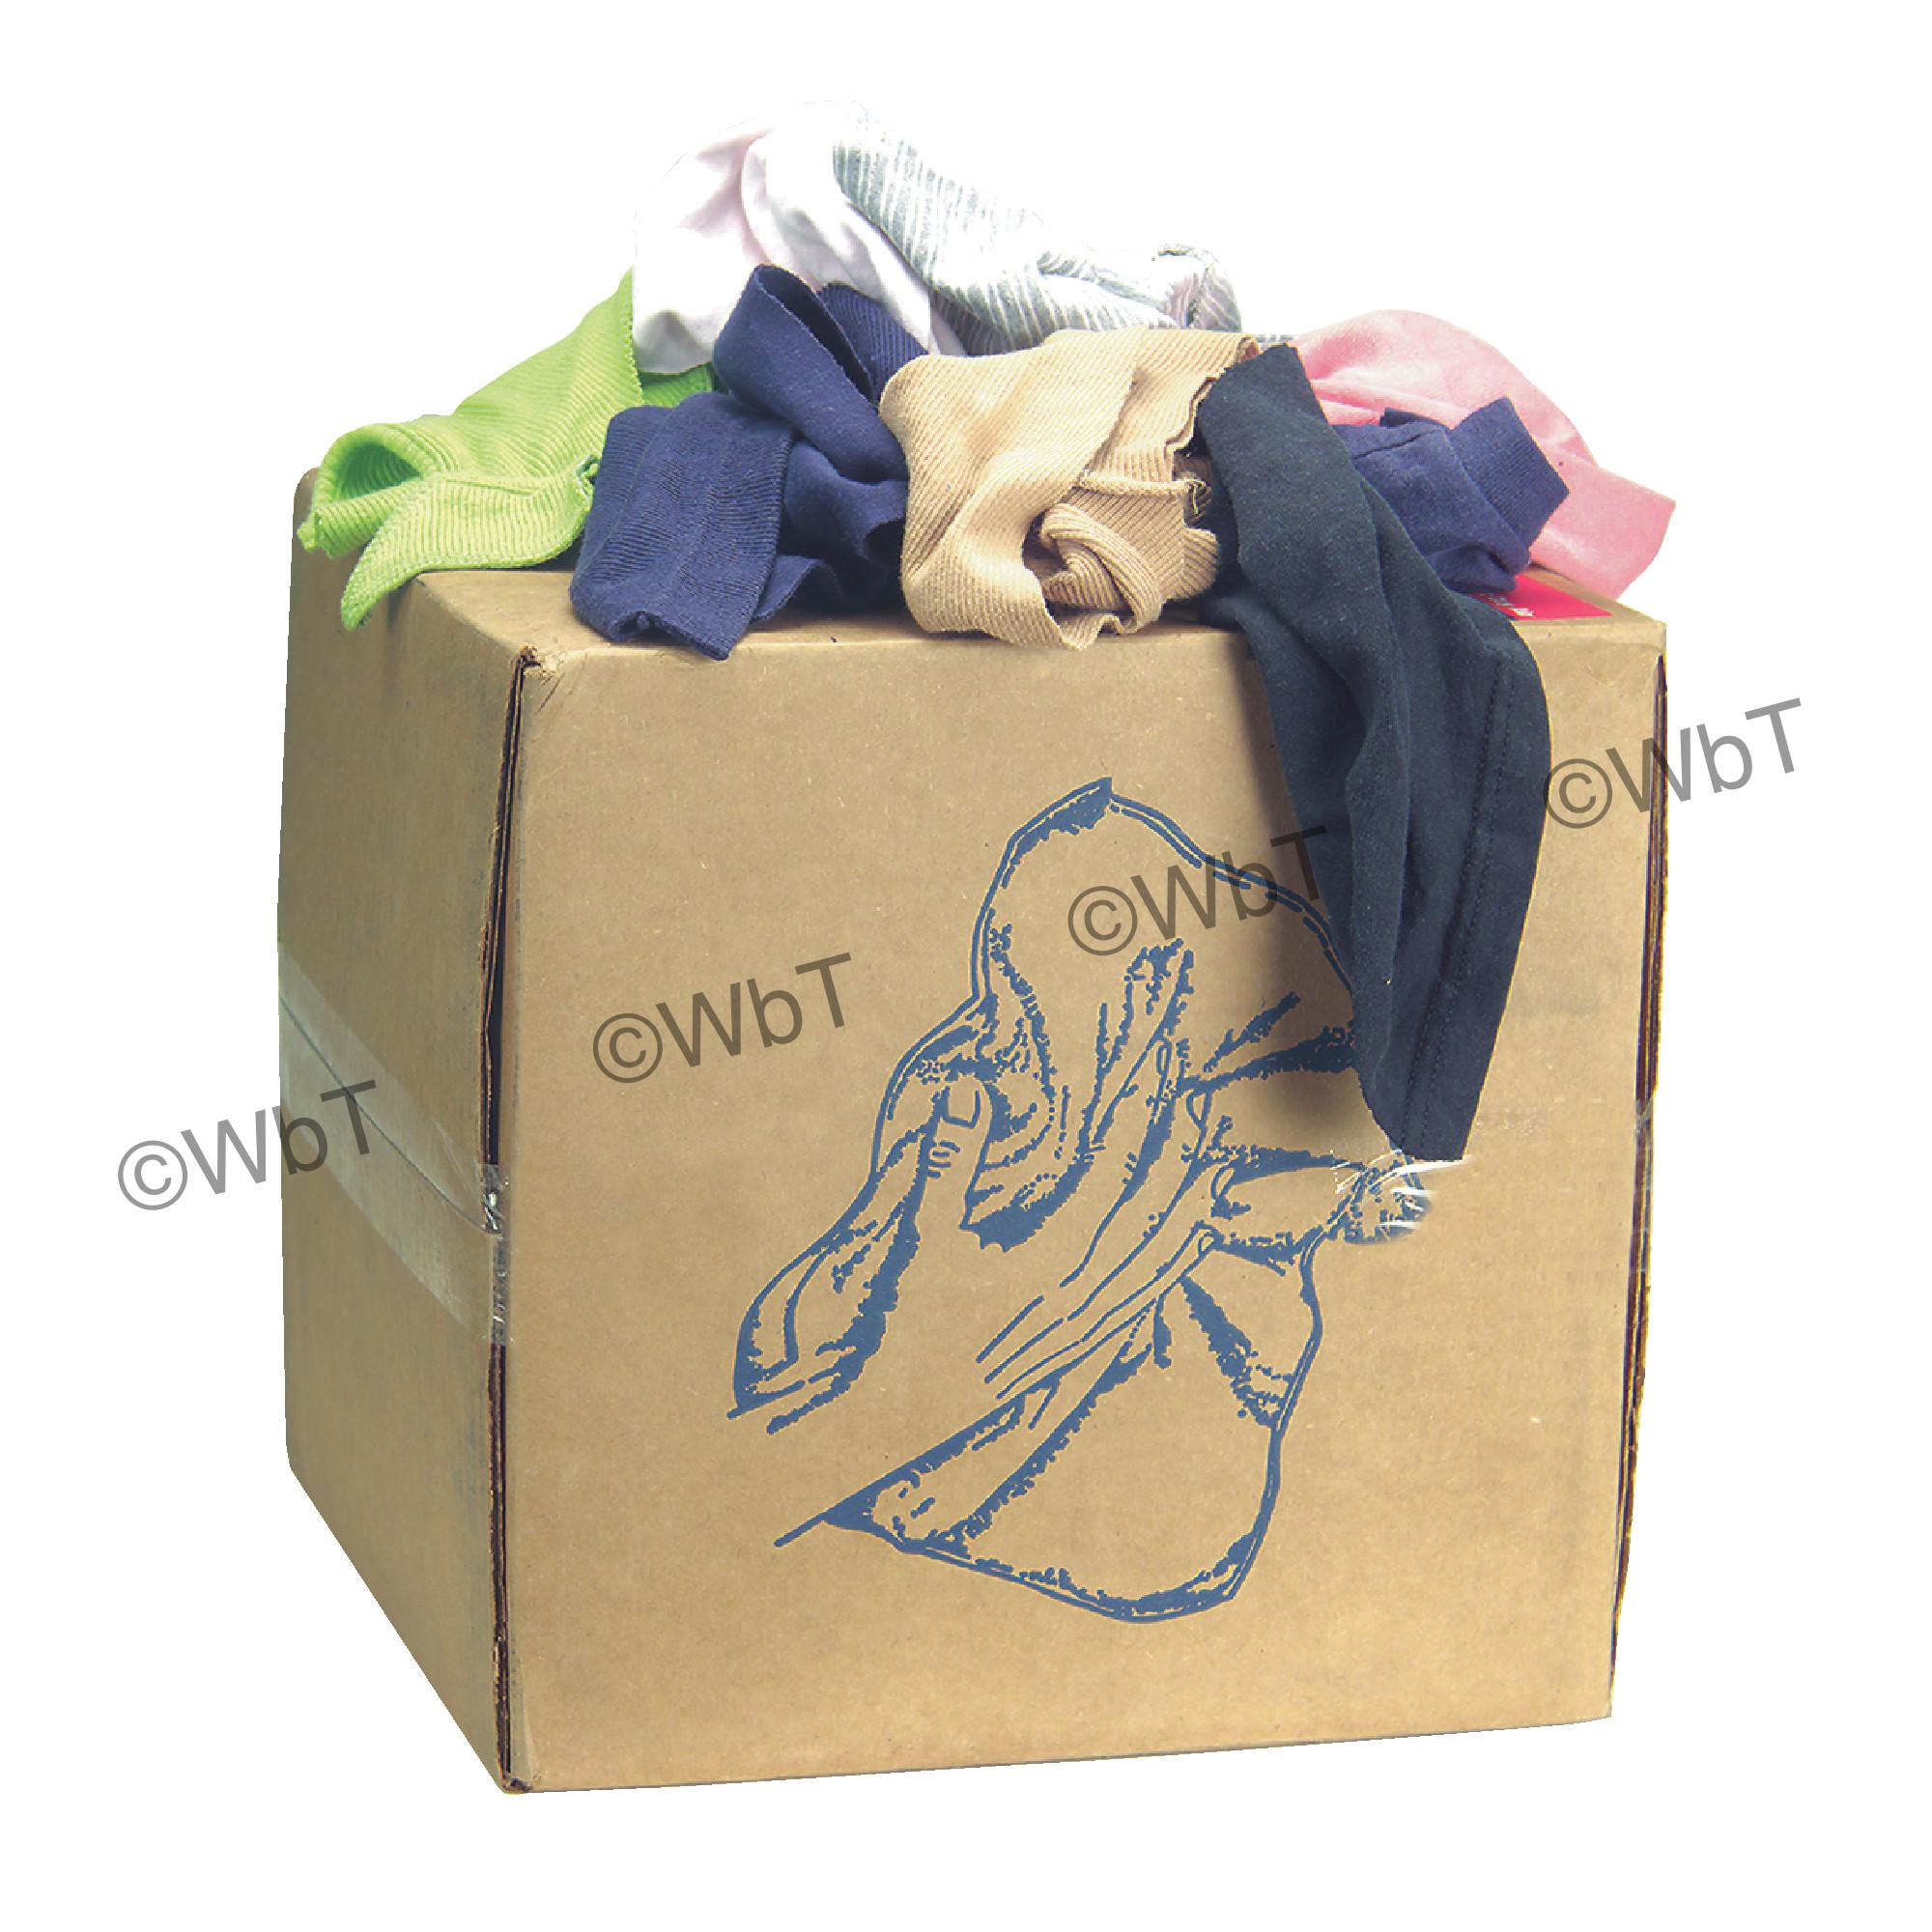 10 Lbs Economy Box of Cloth Rags